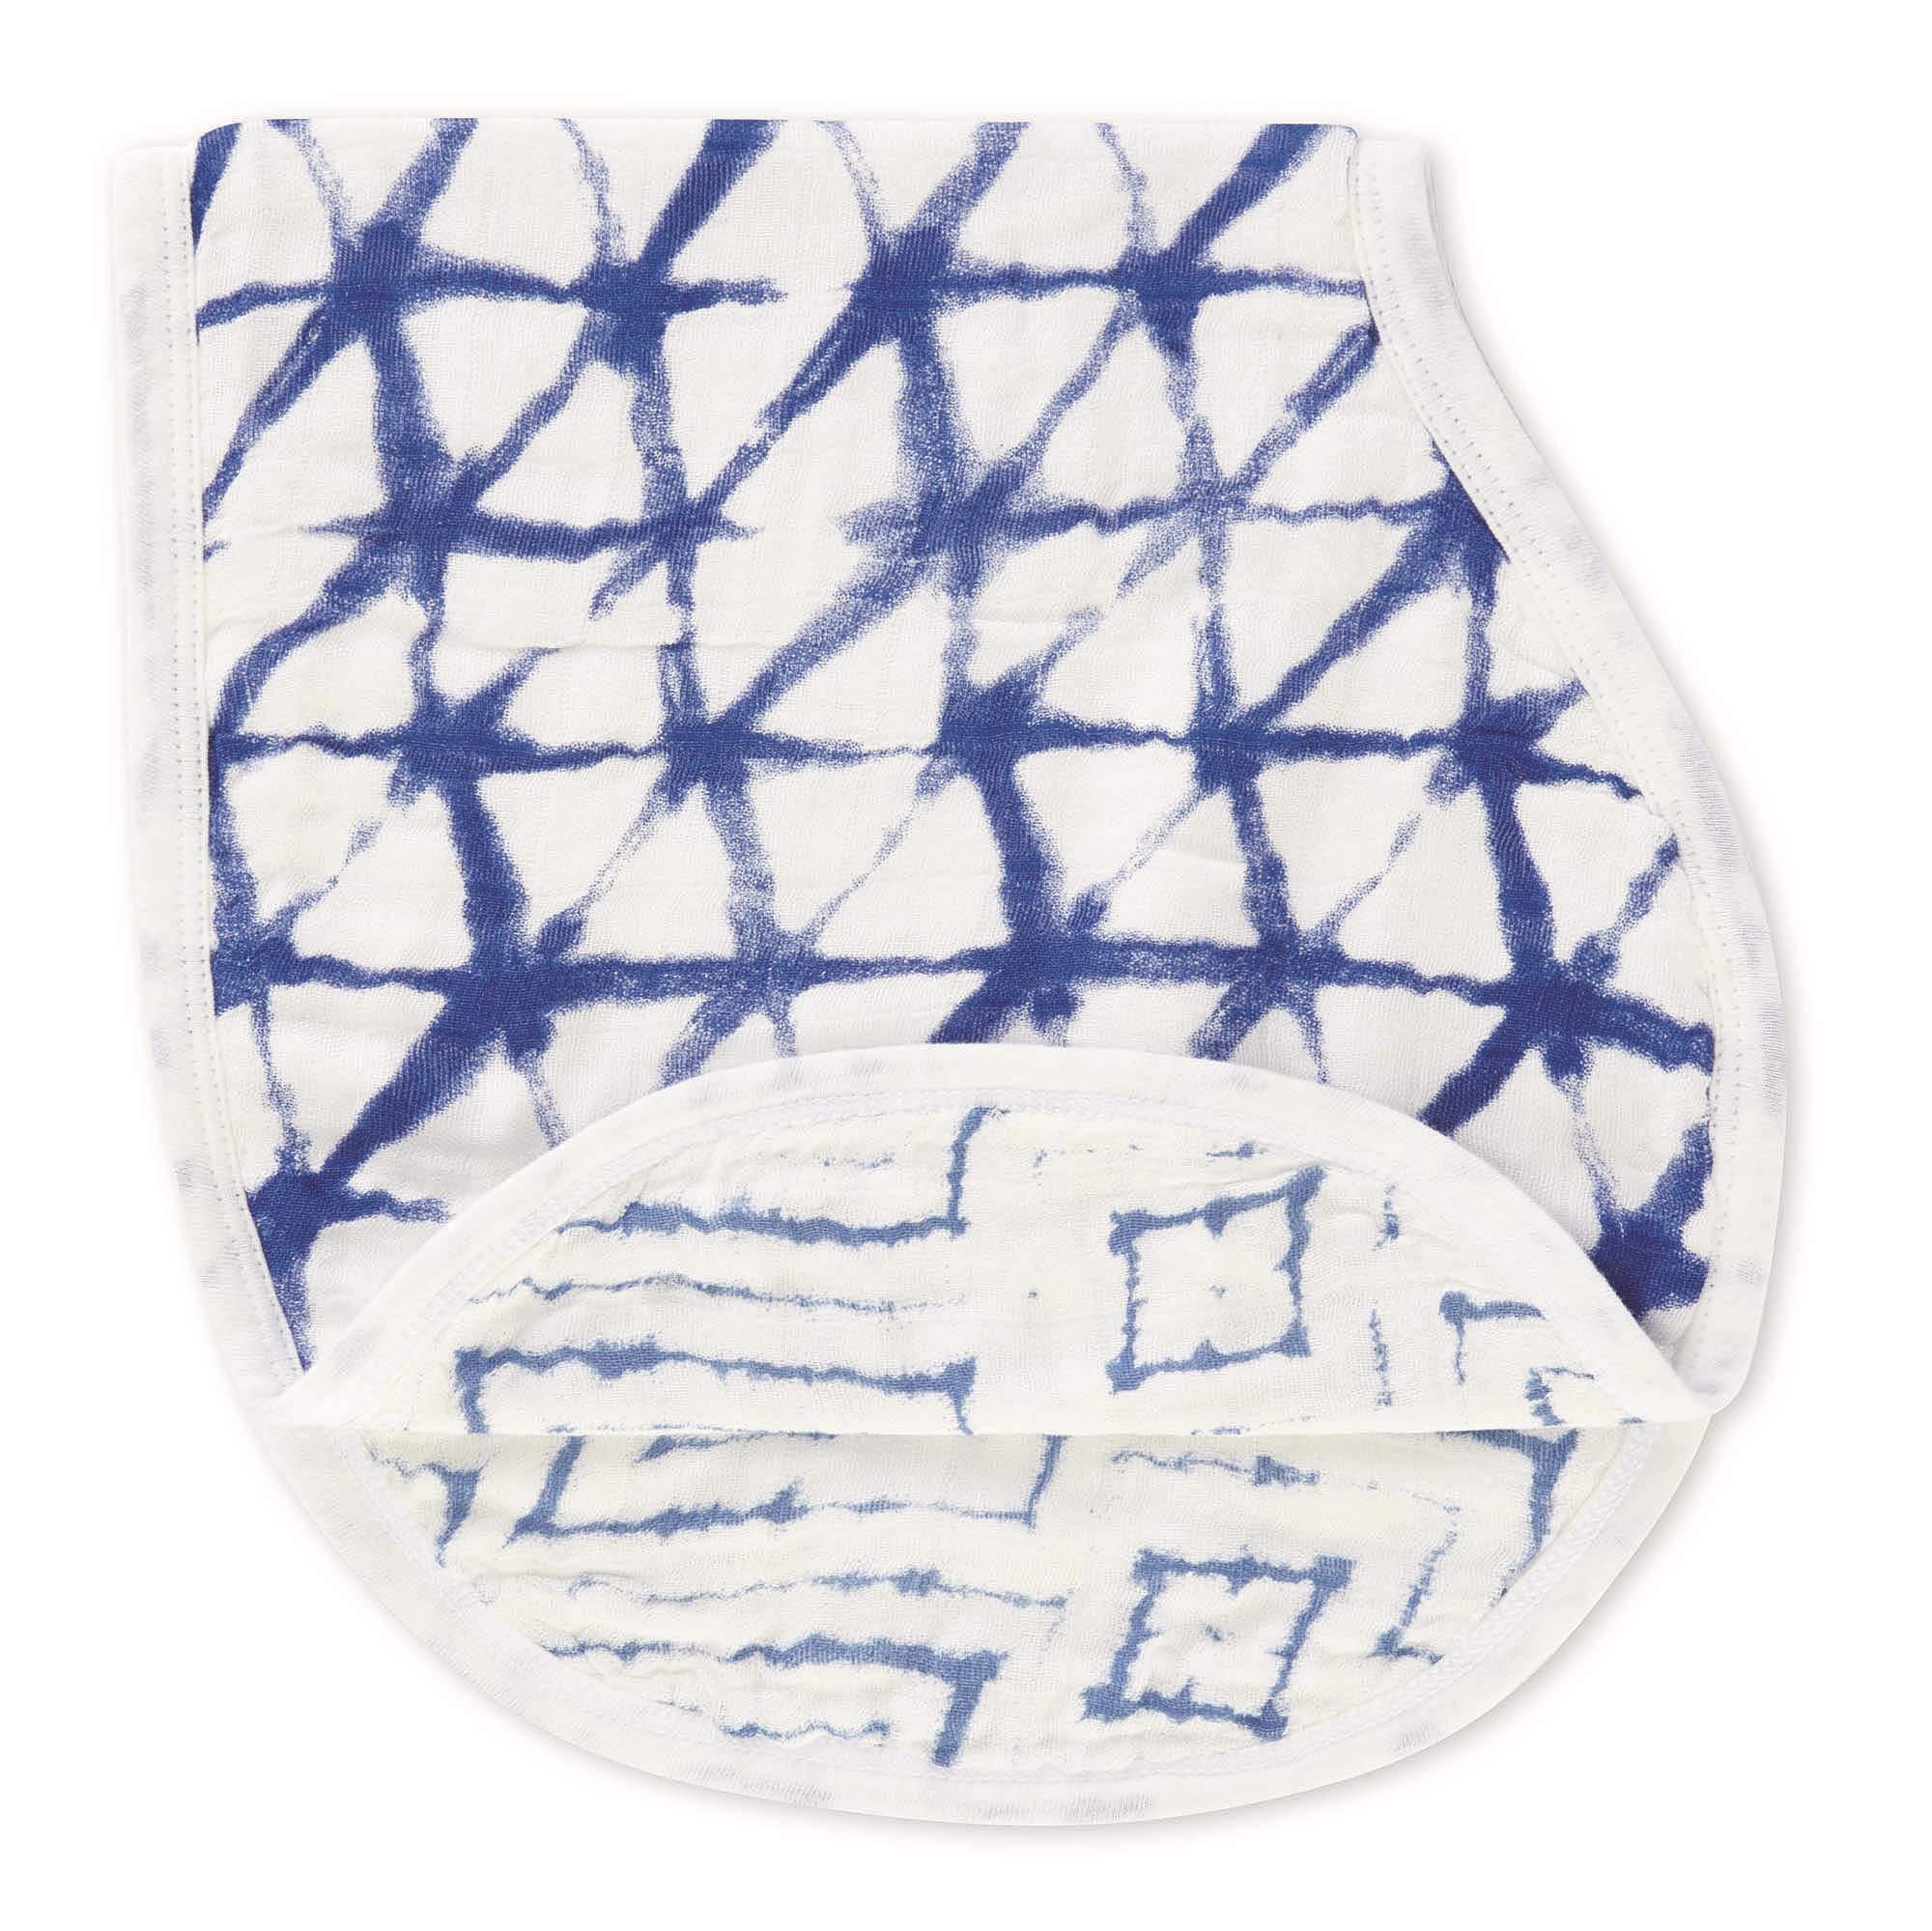 "aden + anais Silky Soft Burpy Bib, 100% Viscose bamboo Muslin, Soft Absorbent 4 Layers, Multi-Use Burp Cloth and Bib, 22.5"" X 11"", Single,  Indigo Shibori"